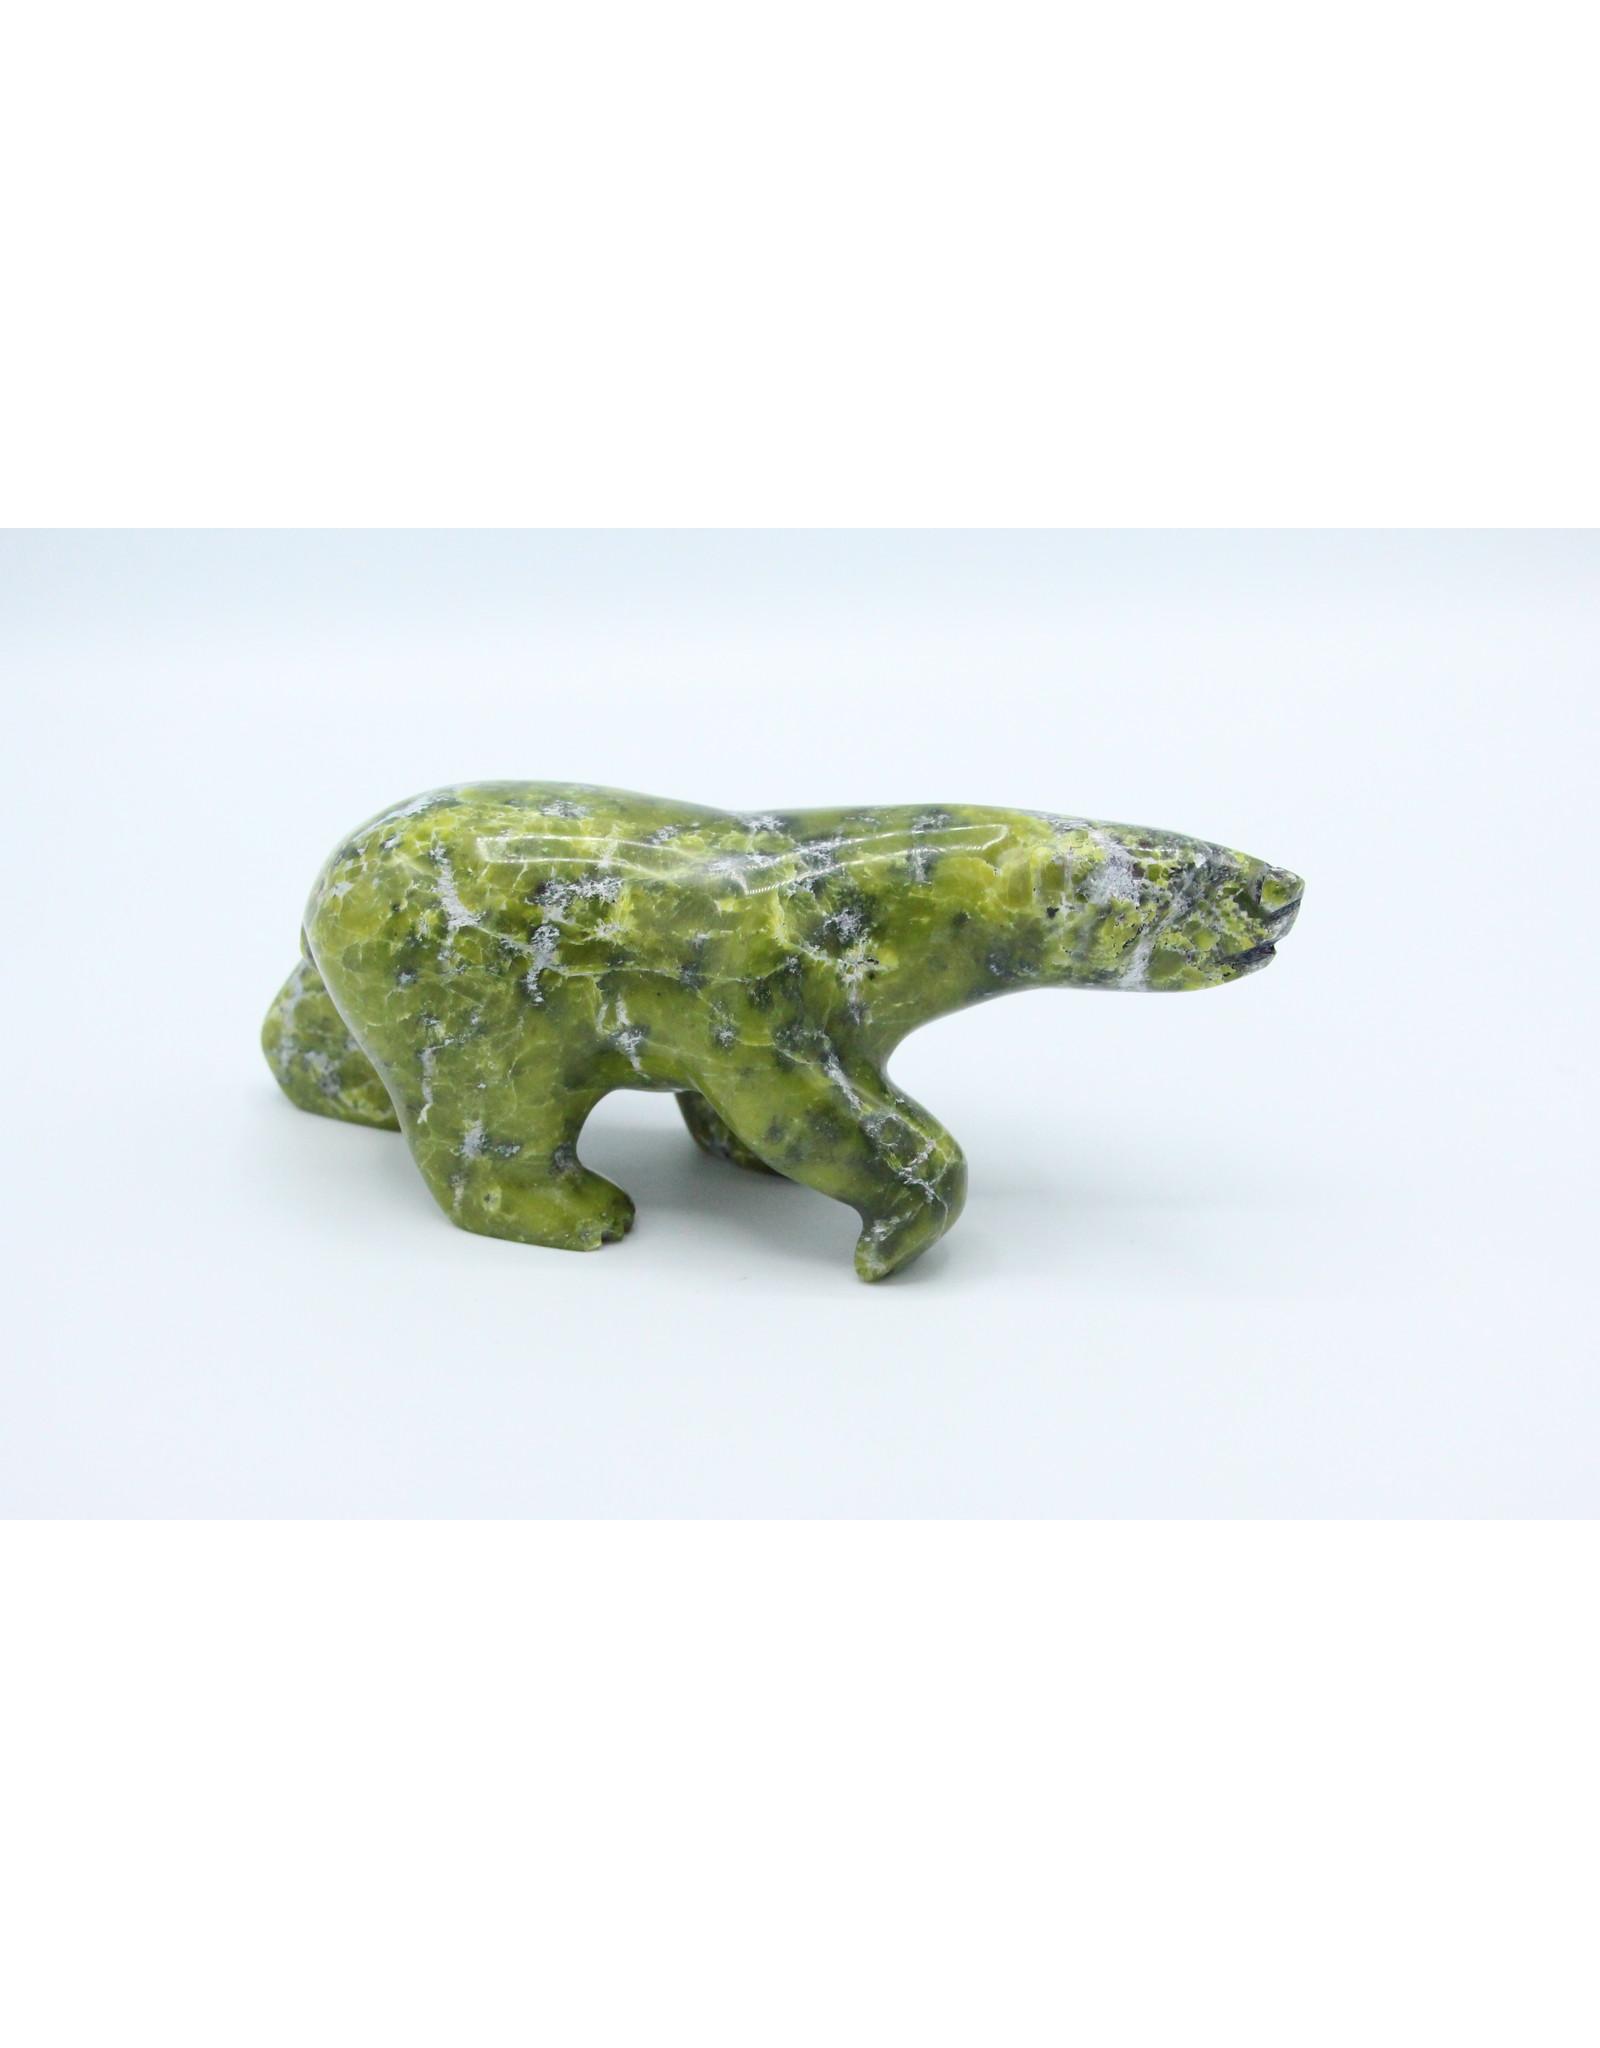 Walking Bear by Allan Shutiapik - 202-268891